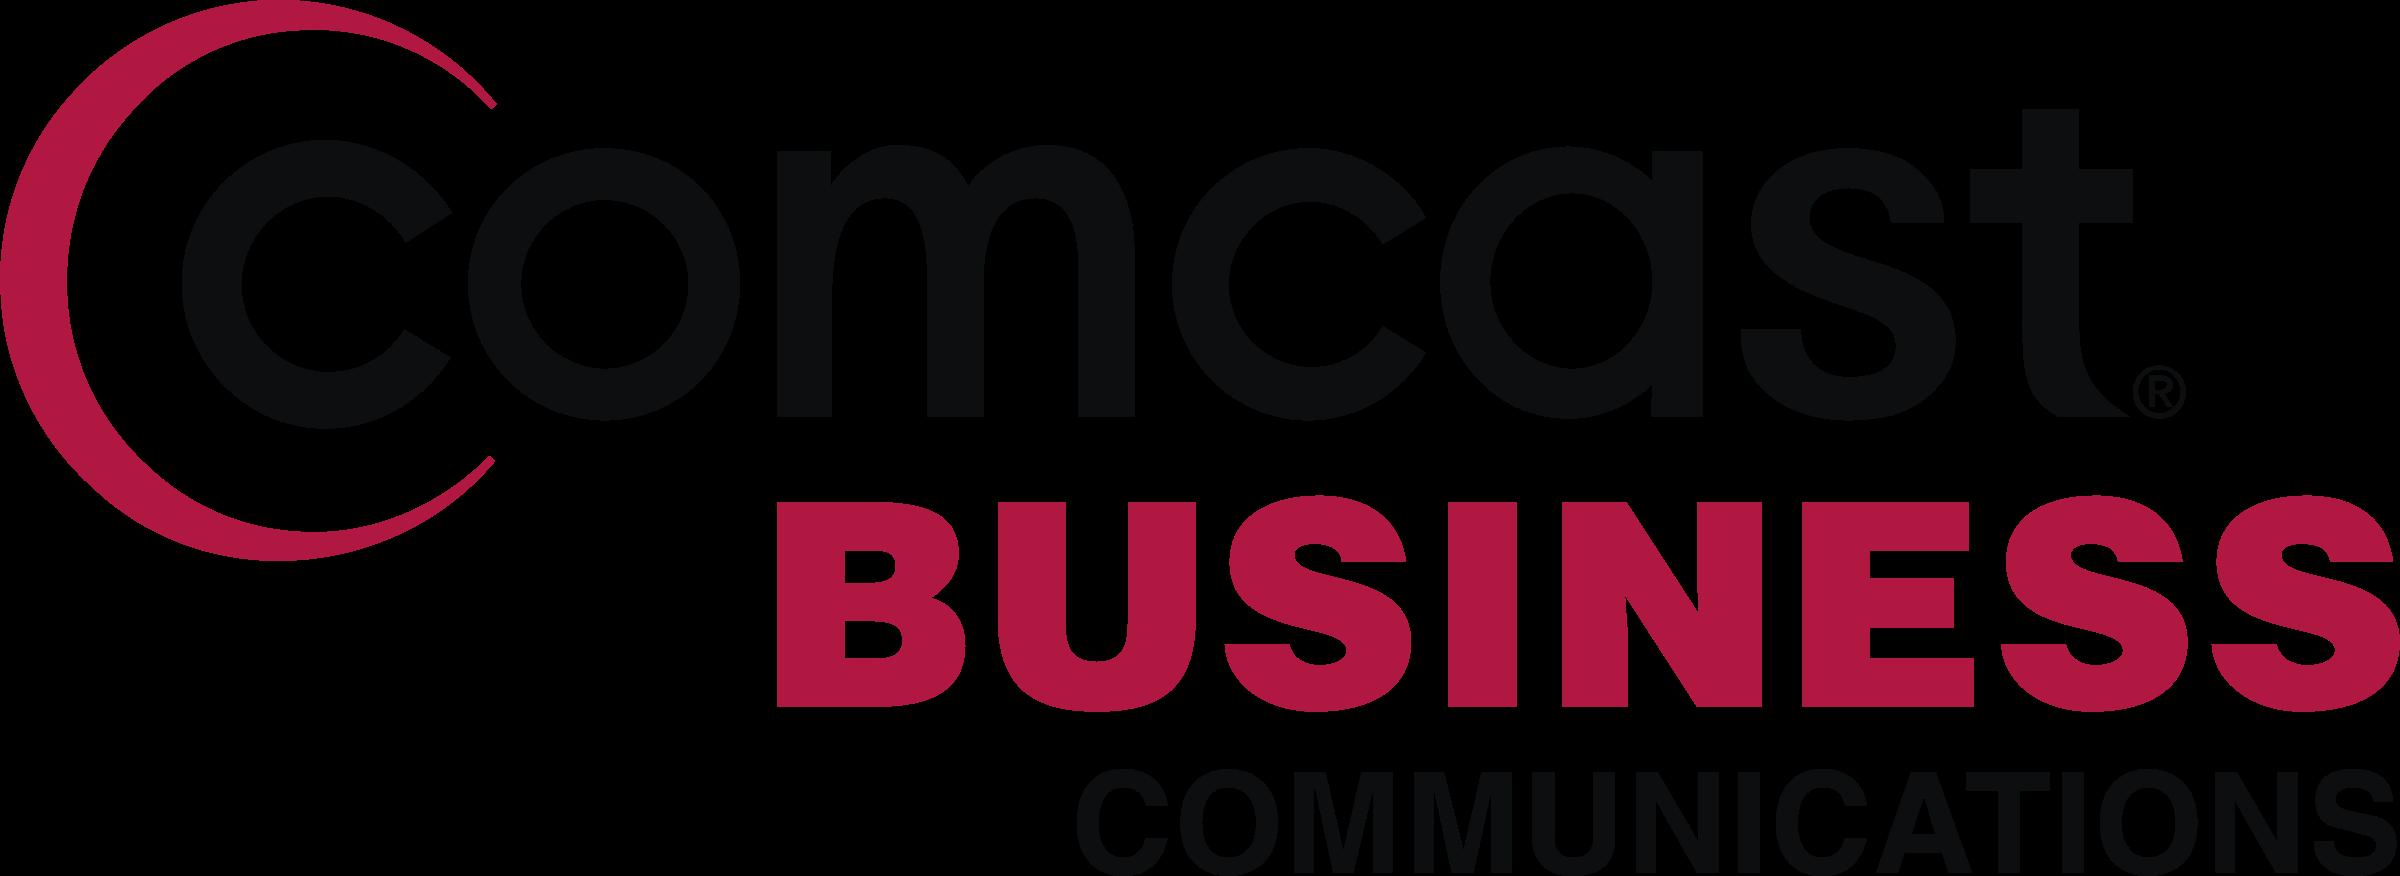 Comcast Business Communicat Logo Png Transparent Svg Vector Freebie Supply